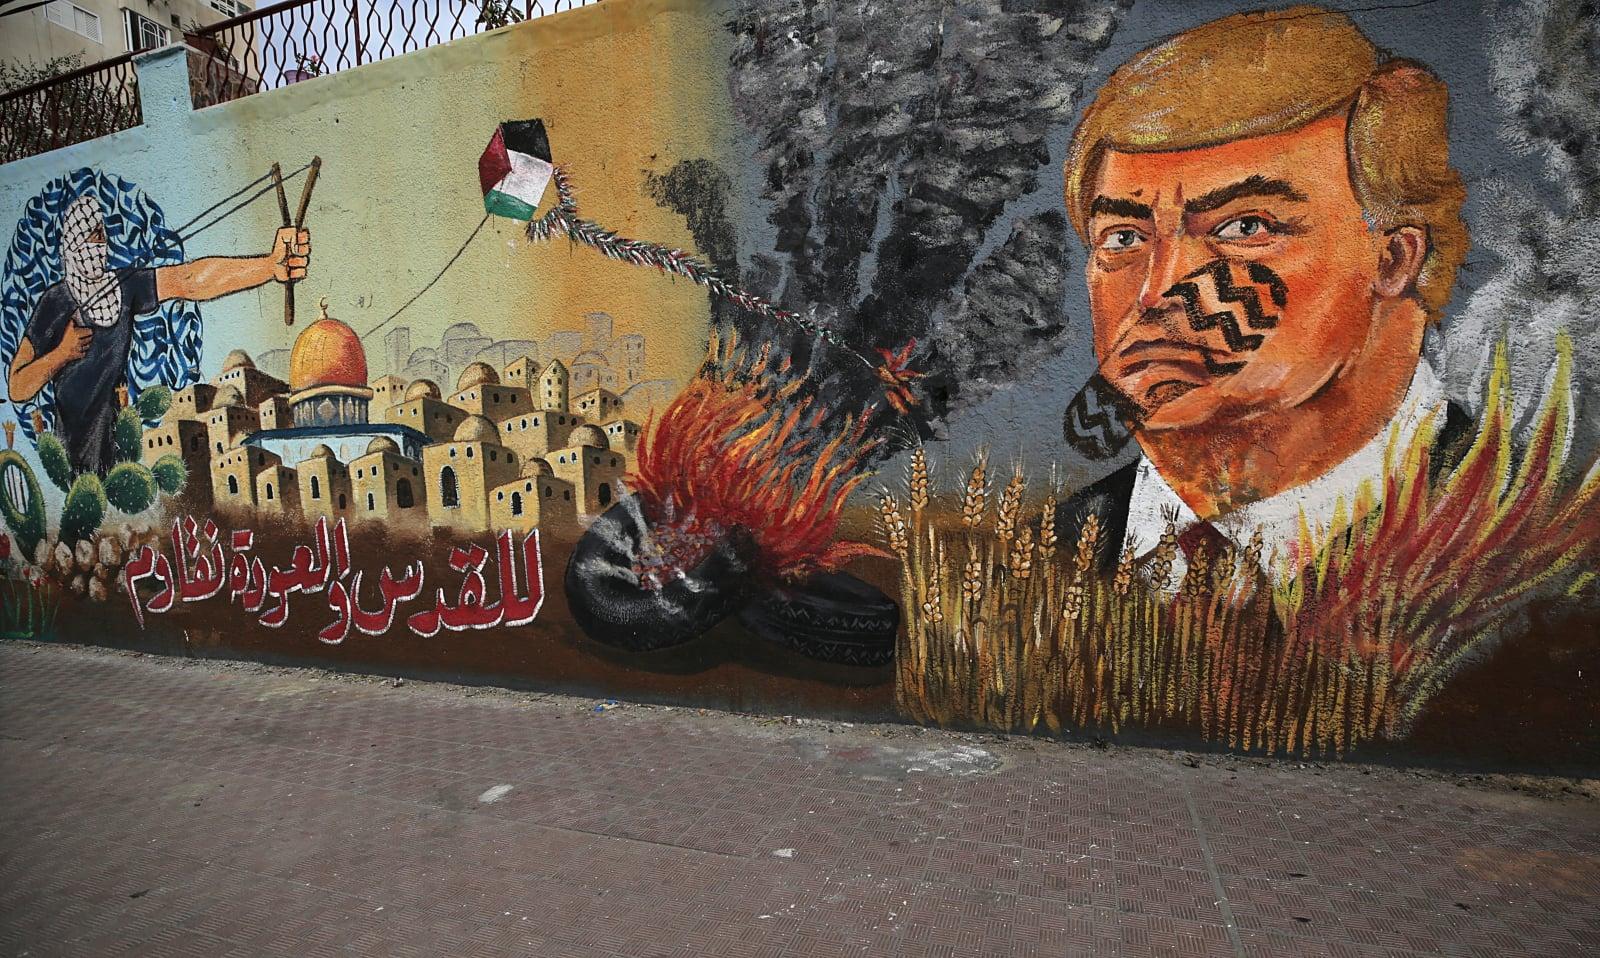 Murale w Strefie Gazy